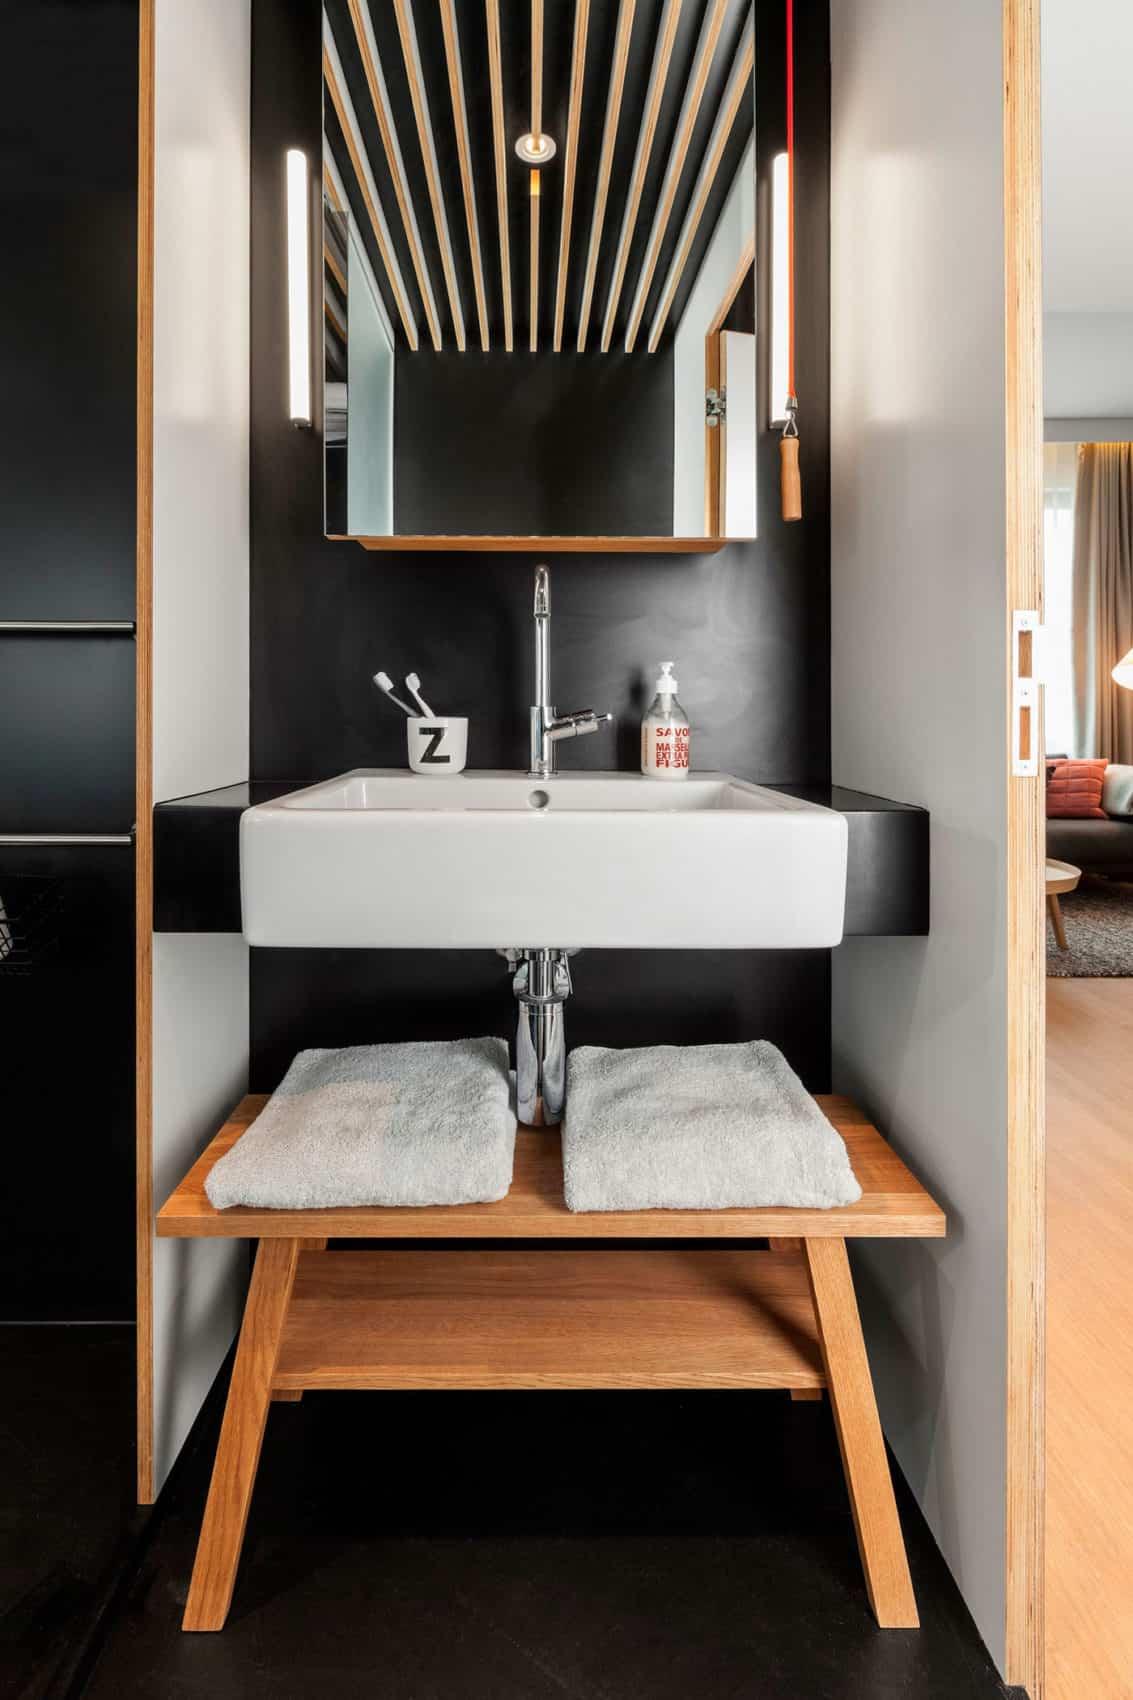 Zoku by Concrete Architectural Associates (11)